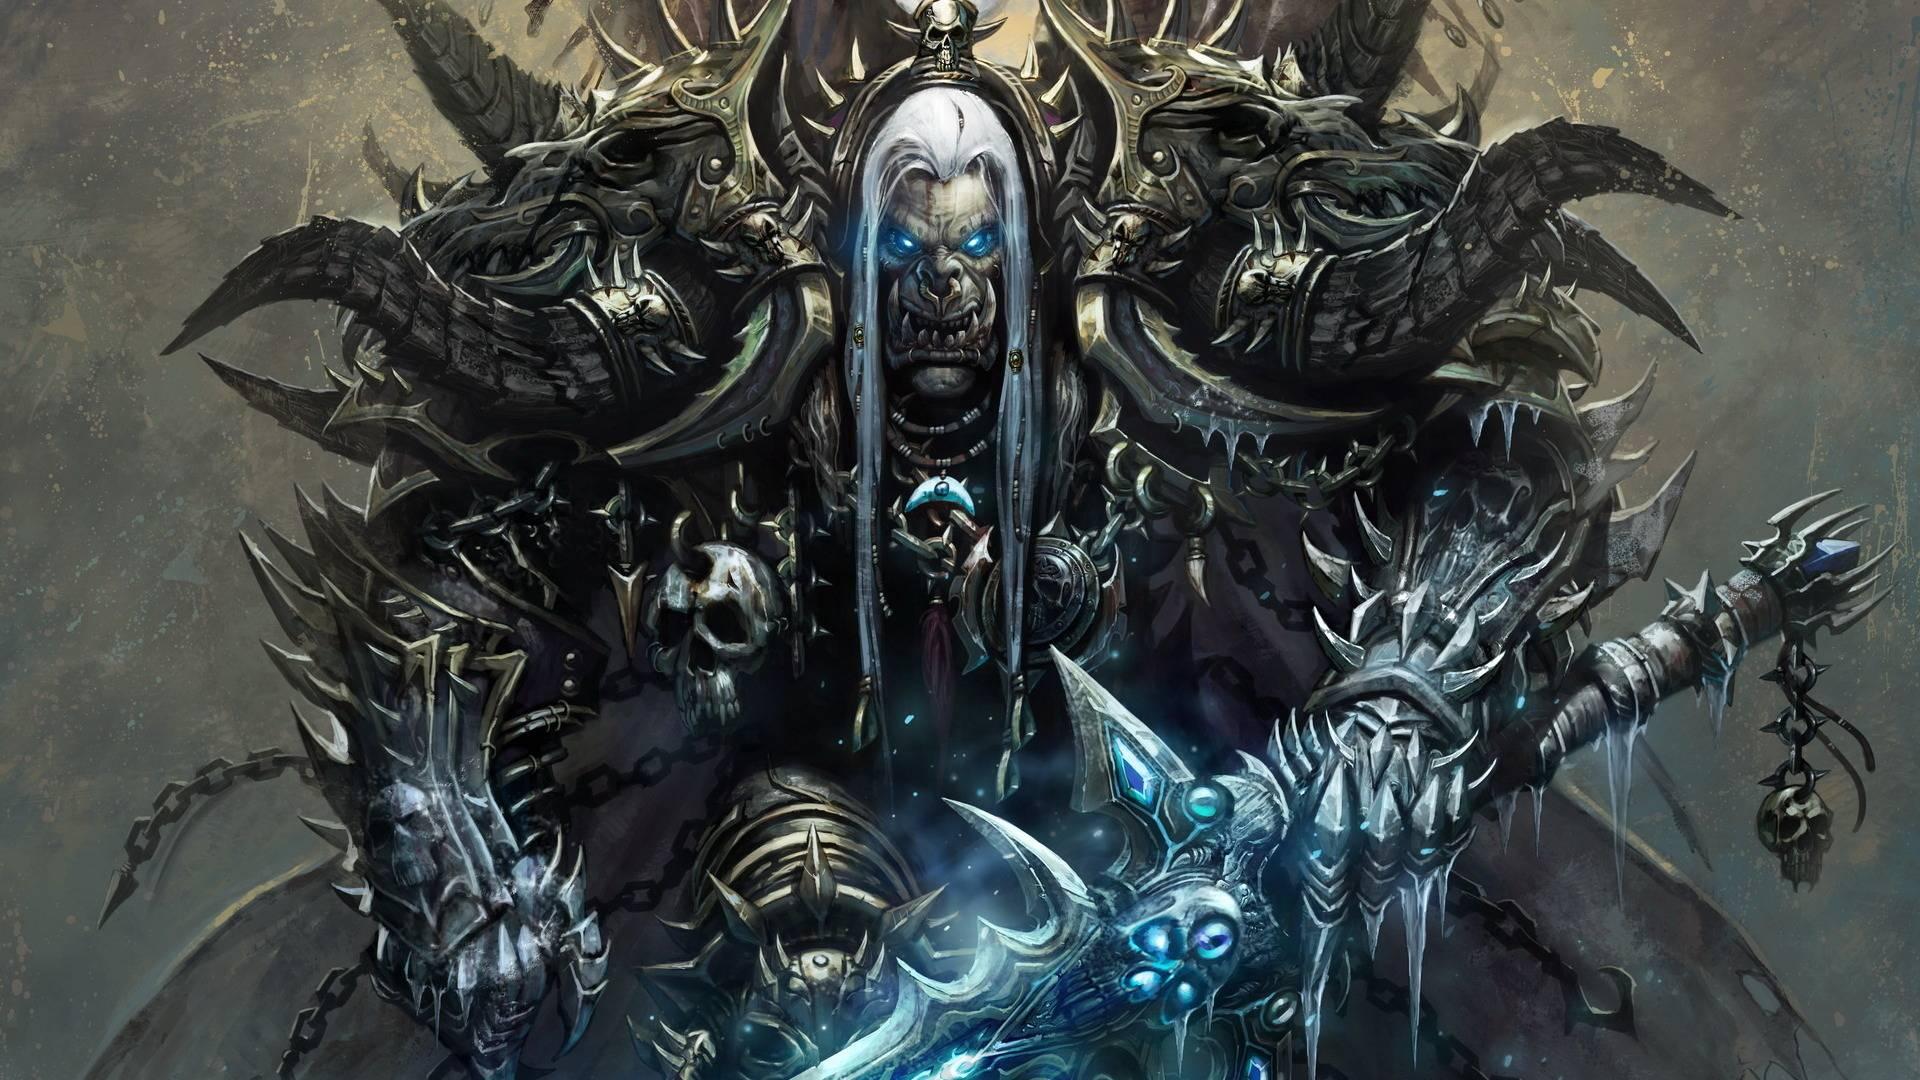 Cool World of Warcraft Wallpaper 05 | hdwallpapers-